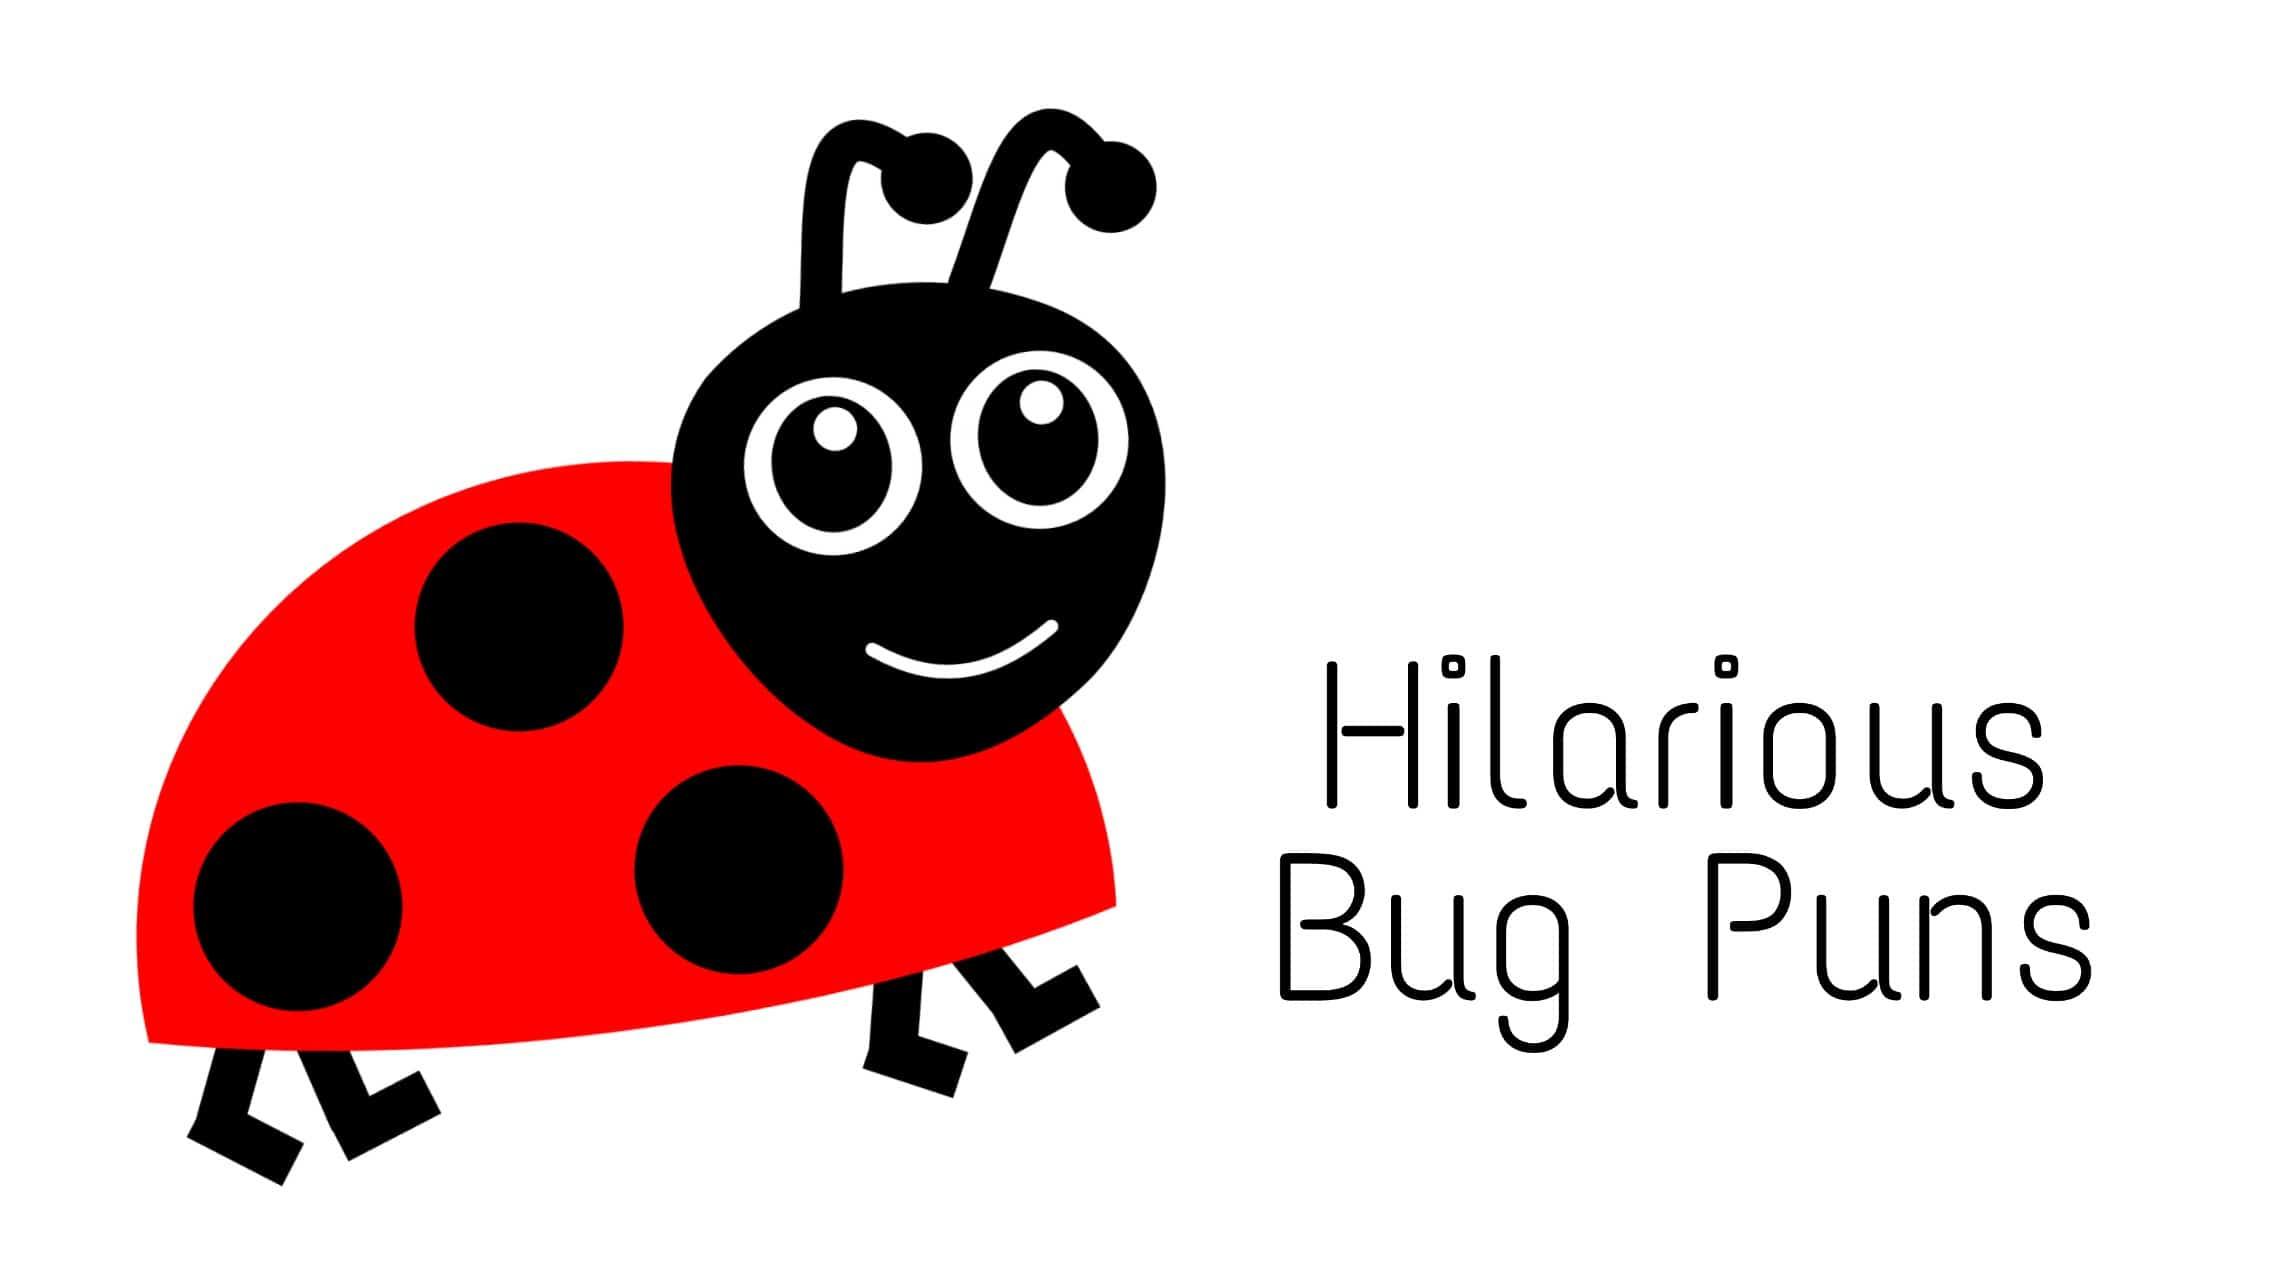 funny bug puns